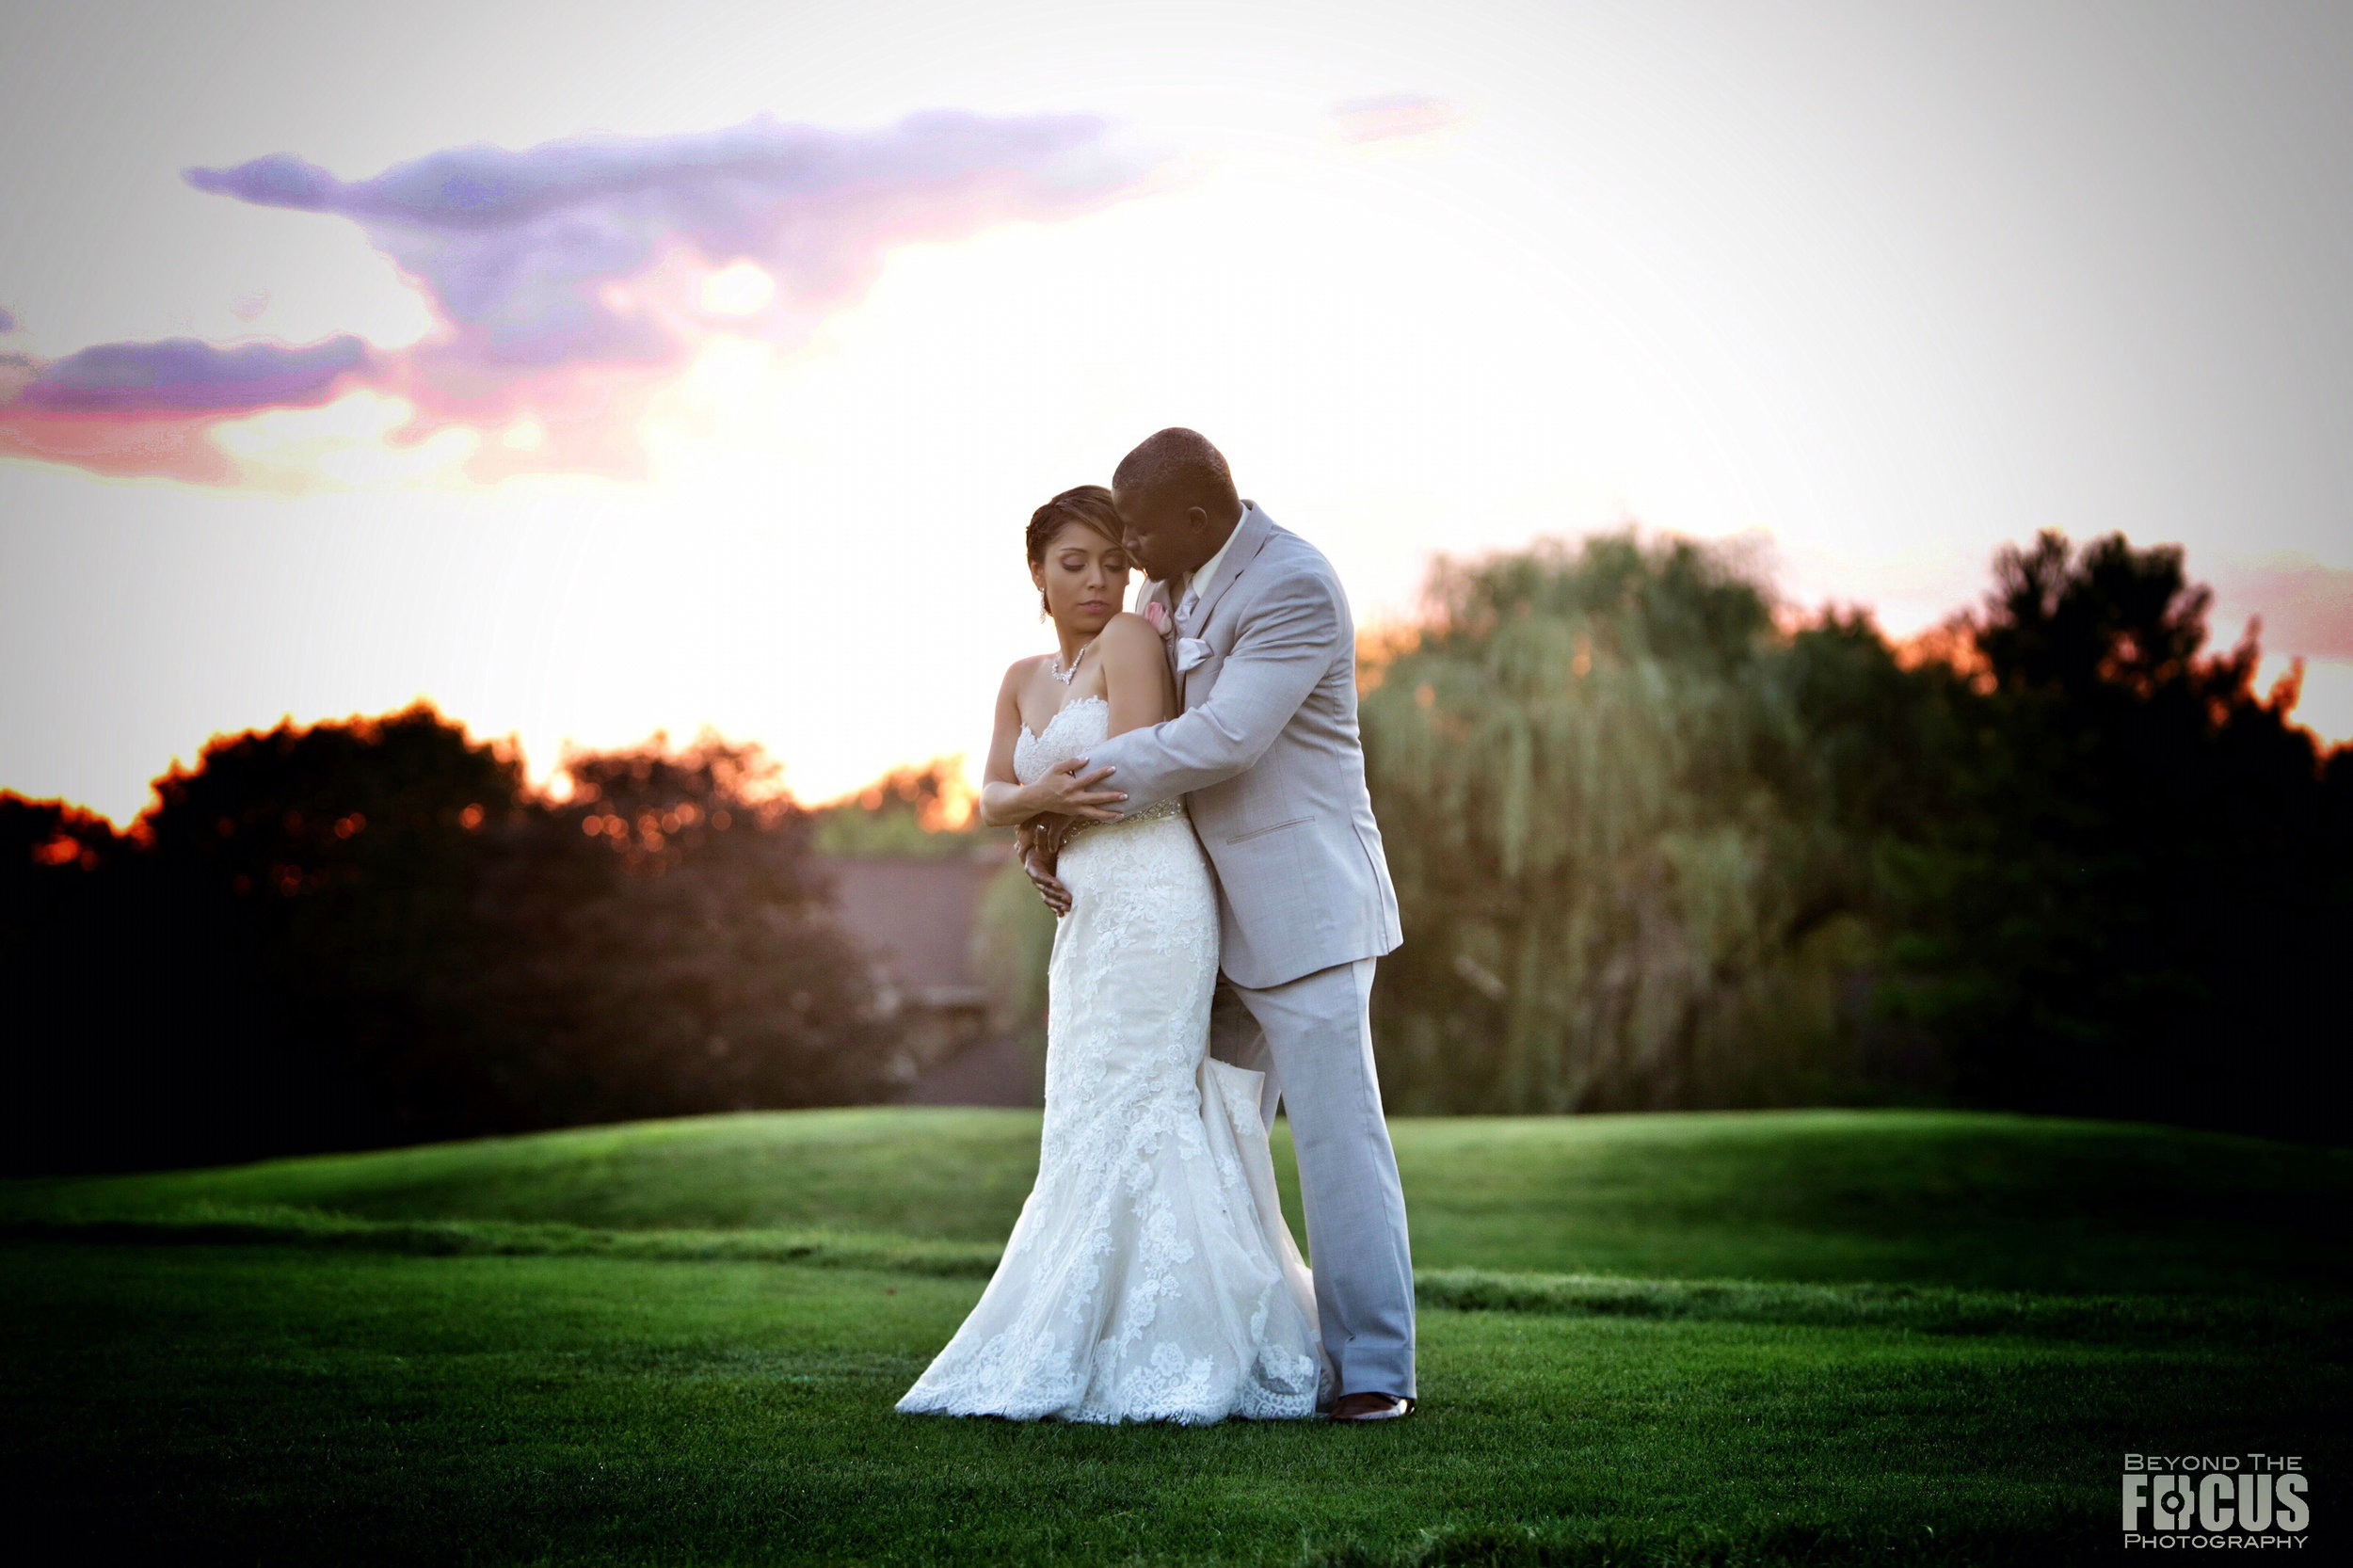 Palmer Wedding - Bride& Groom Post Wedding 14.jpg